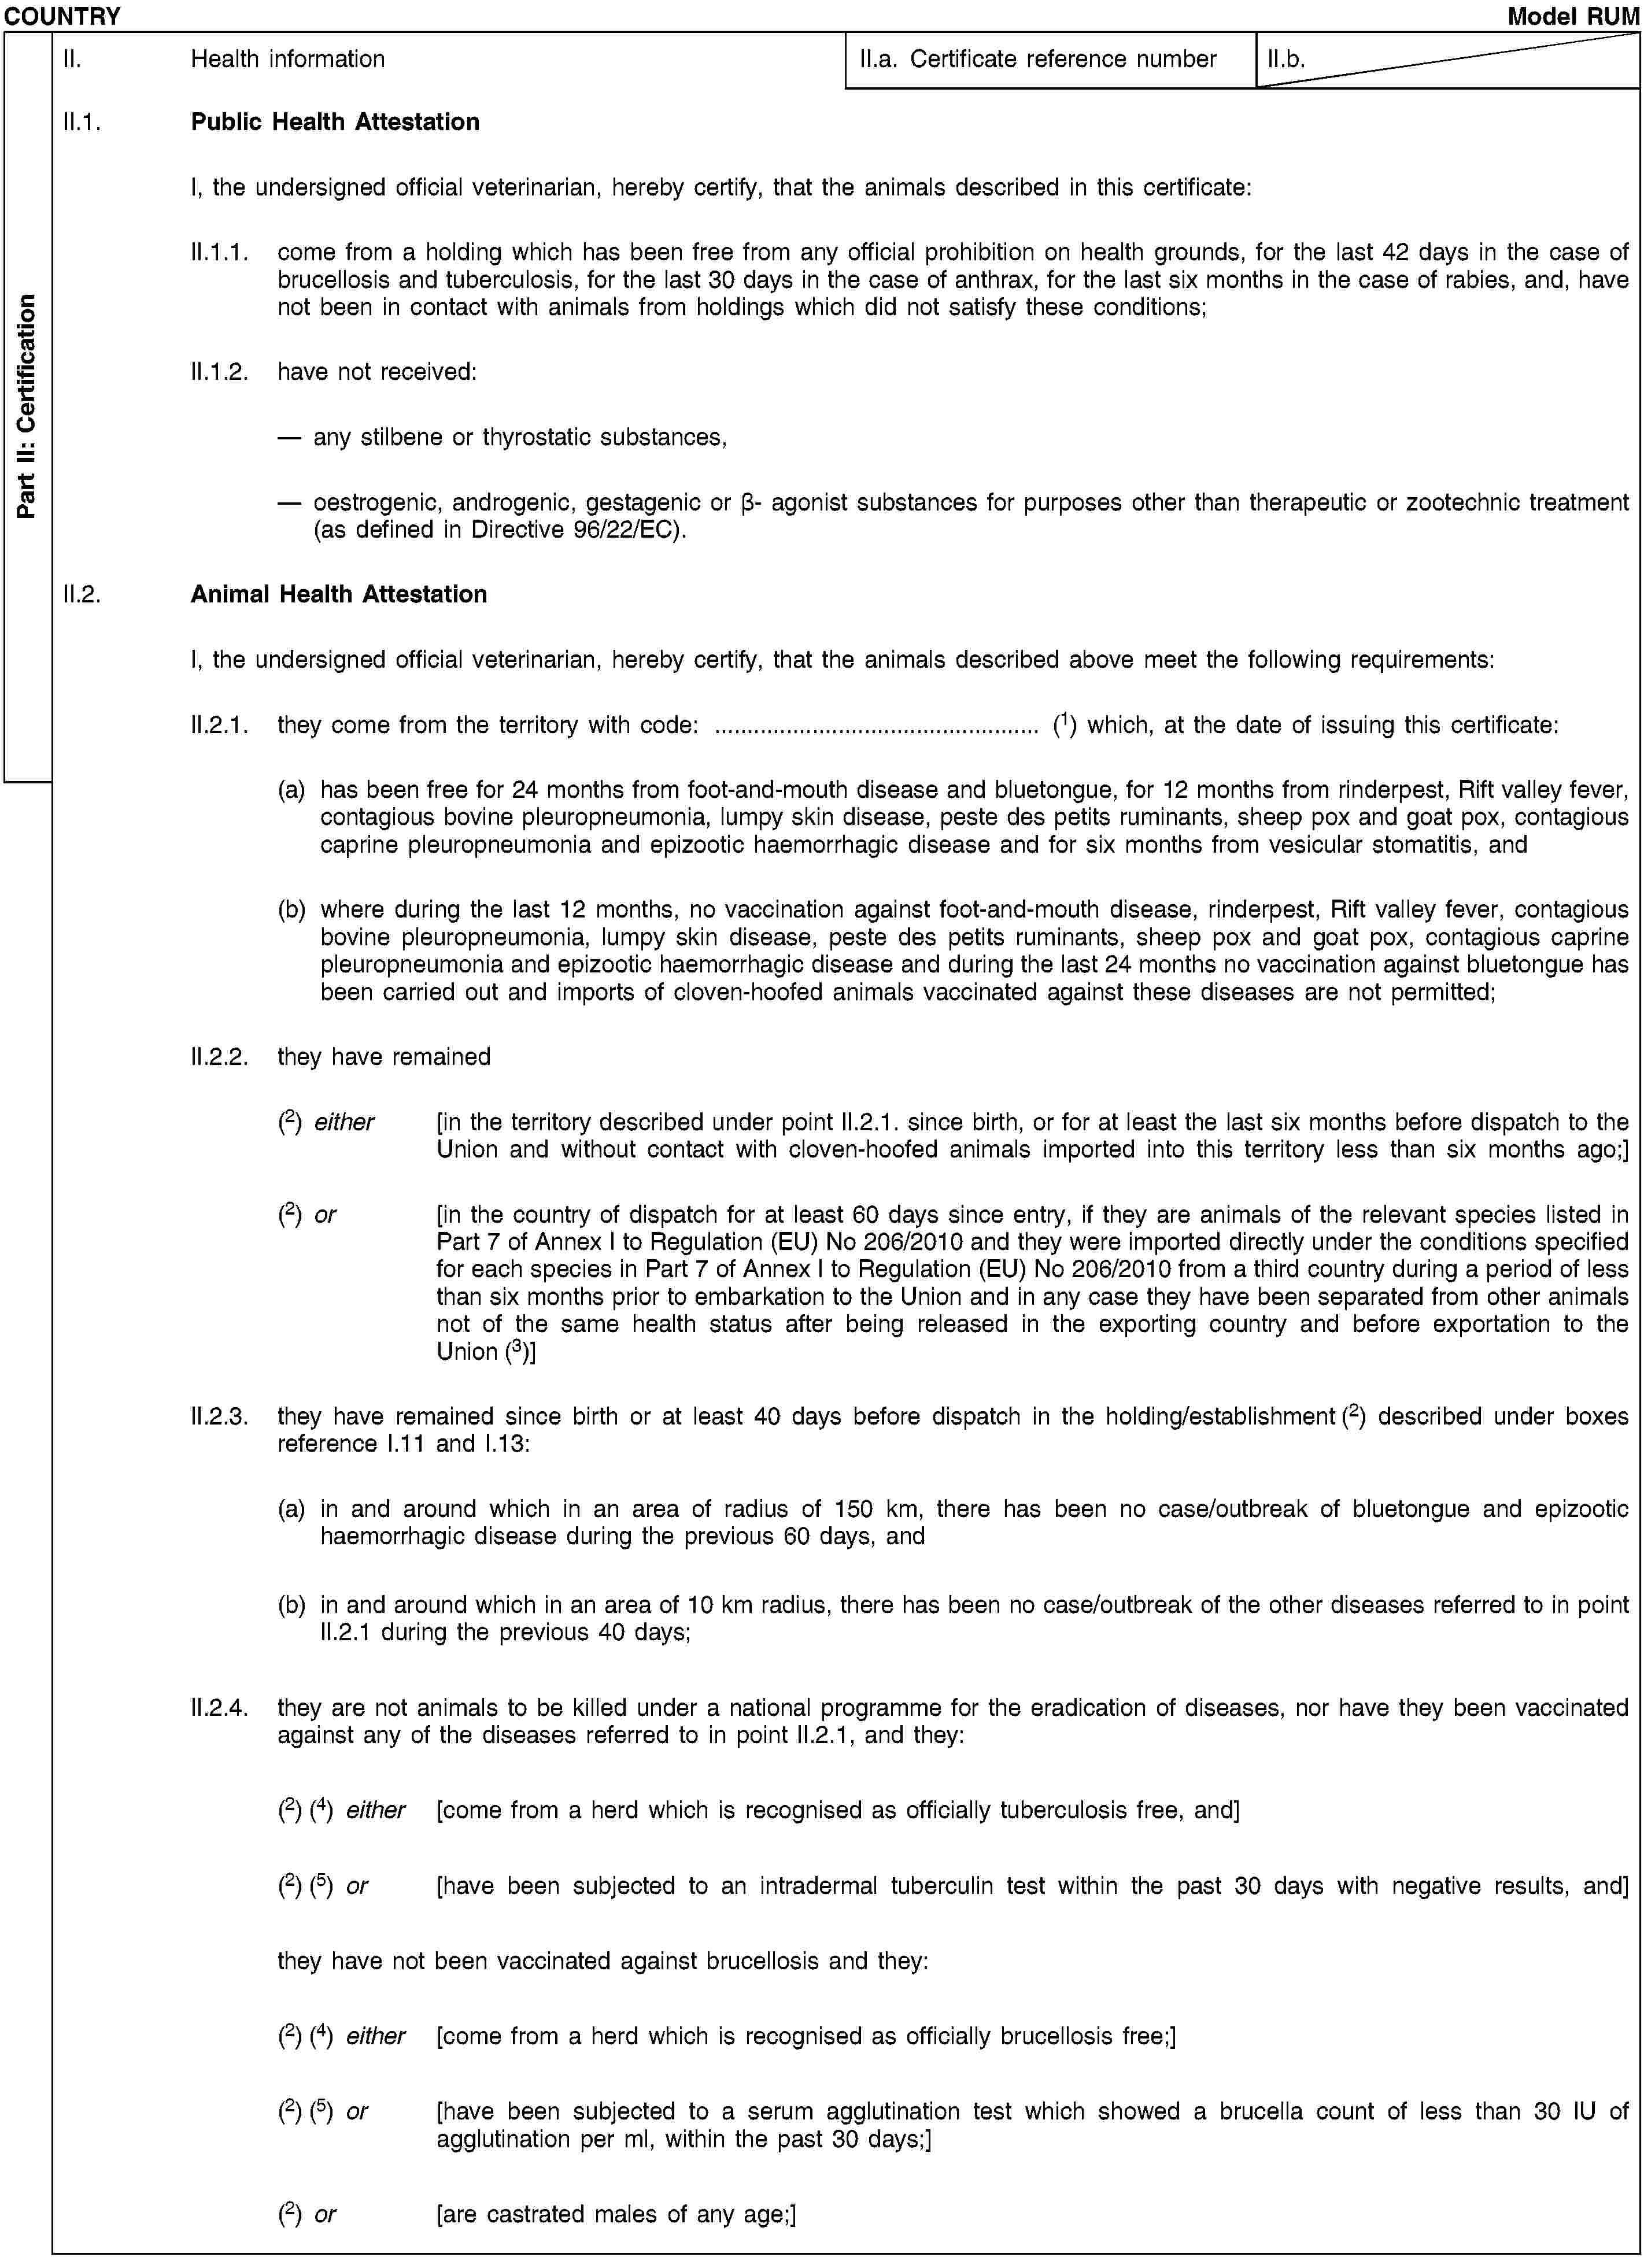 EUR-Lex - 02010R0206-20130225 - EN - EUR-Lex